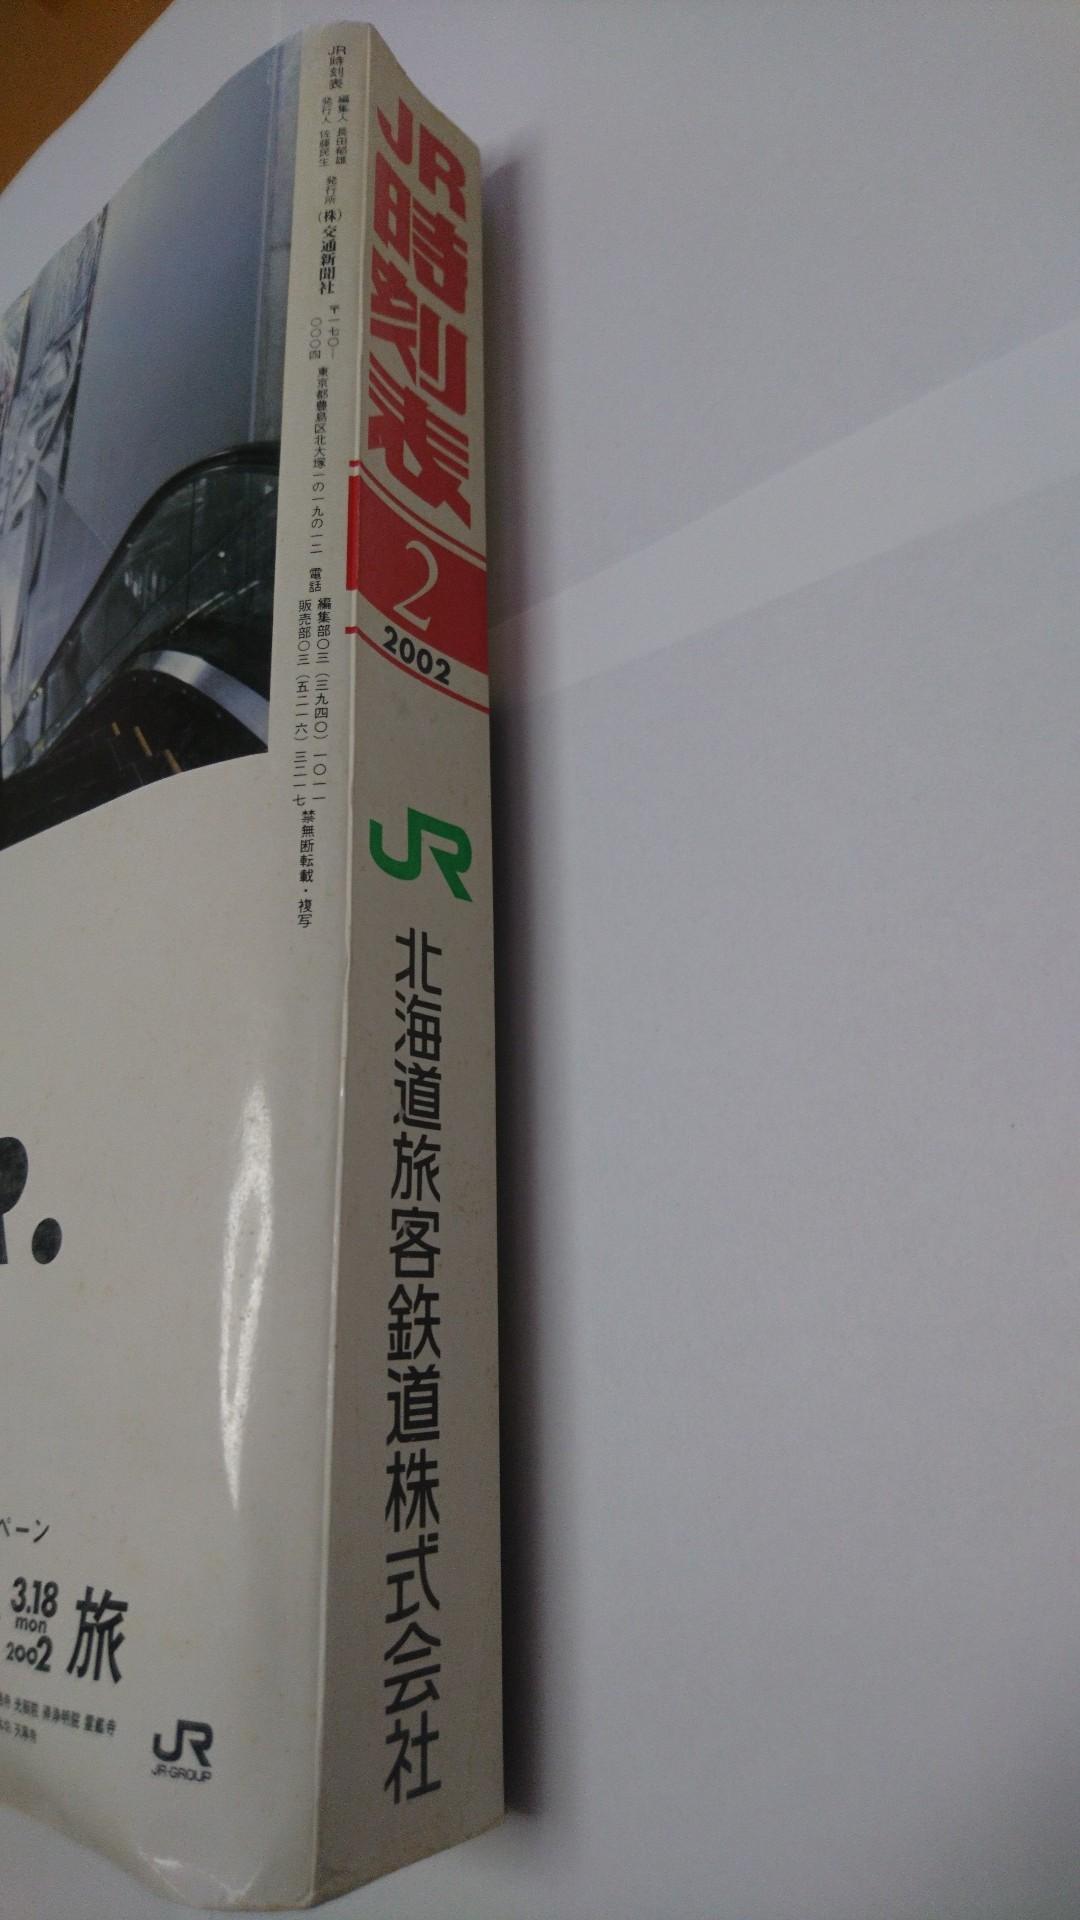 JR時刻表2002年2月号、あずさ2号復活!JR北海道旅客鉄道株式会社、発行所、交通新聞社_b0106766_19390394.jpg